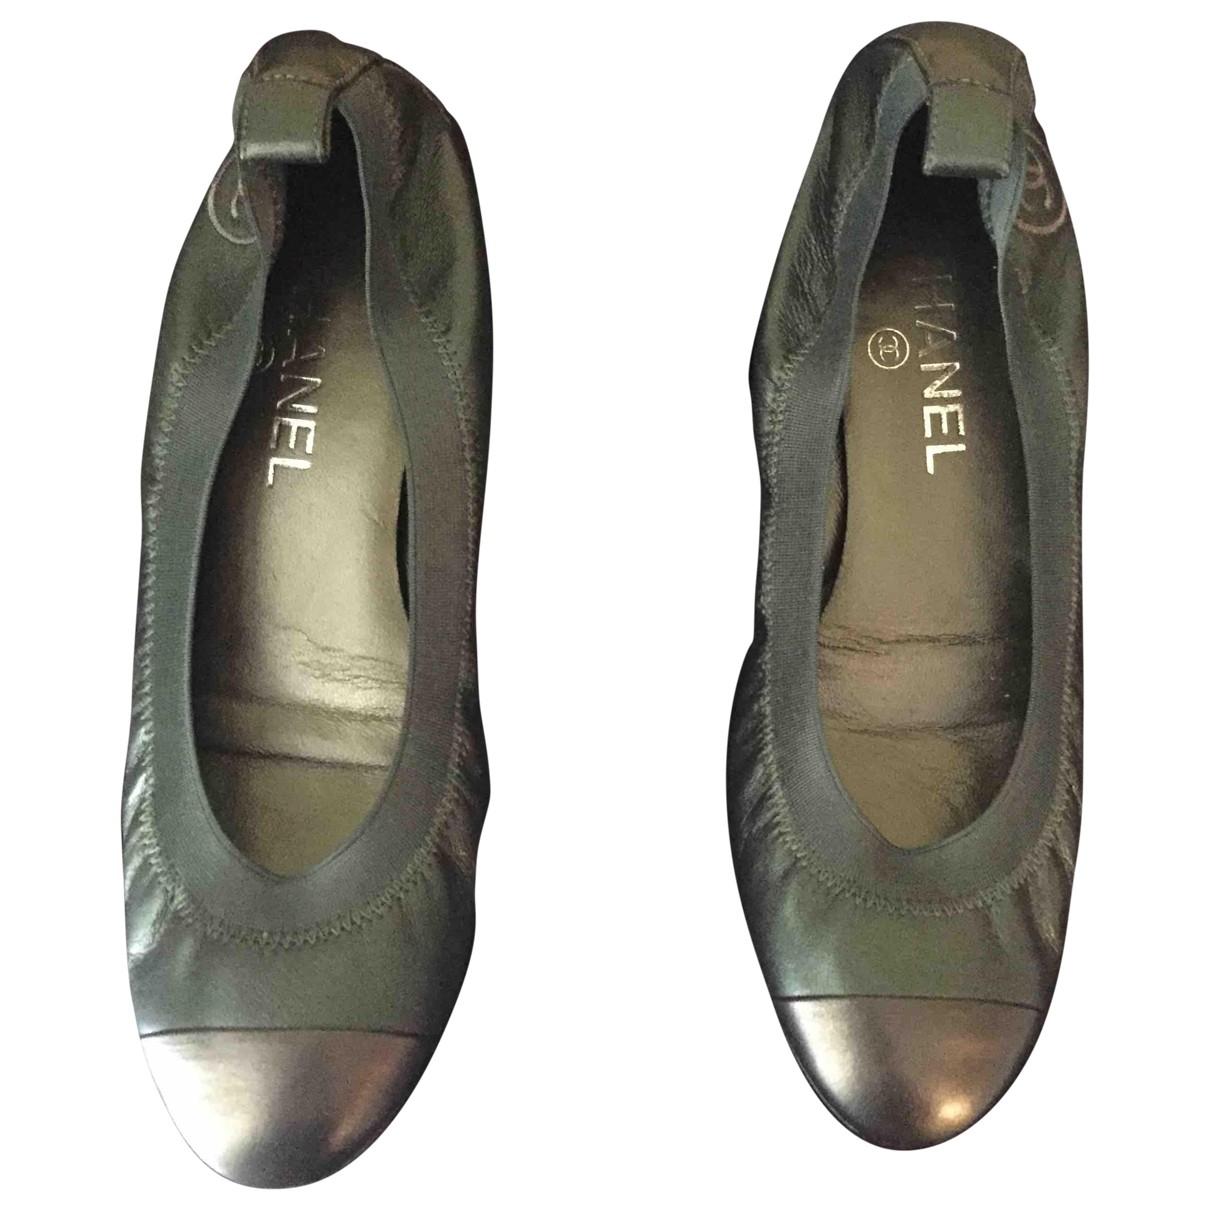 Chanel \N Green Leather Ballet flats for Women 37 EU